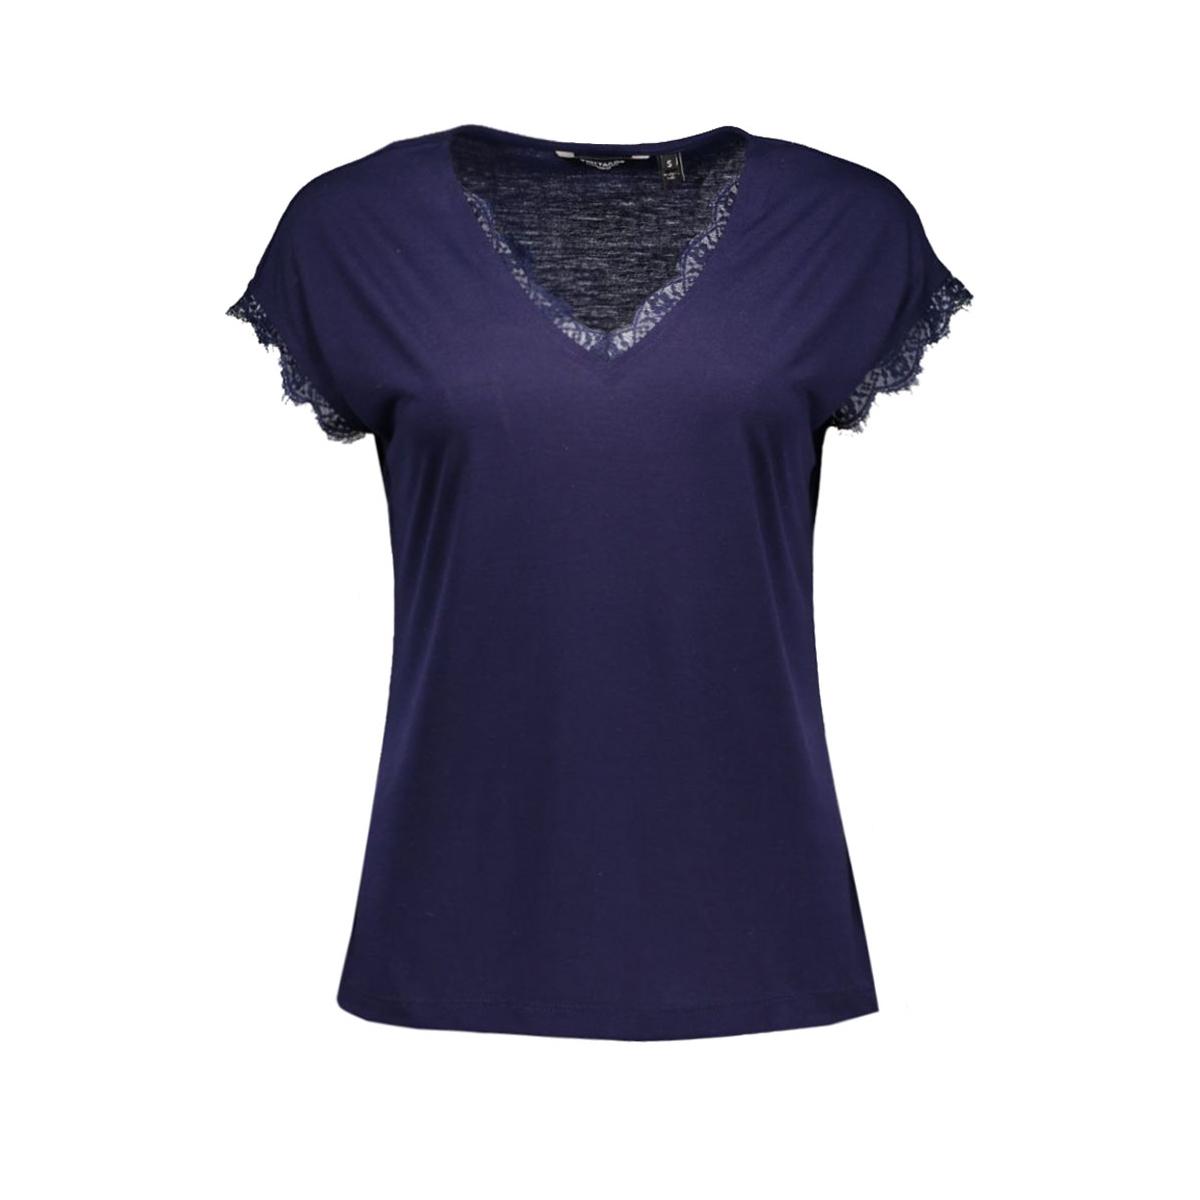 1035220.00.75 tom tailor t-shirt 6946